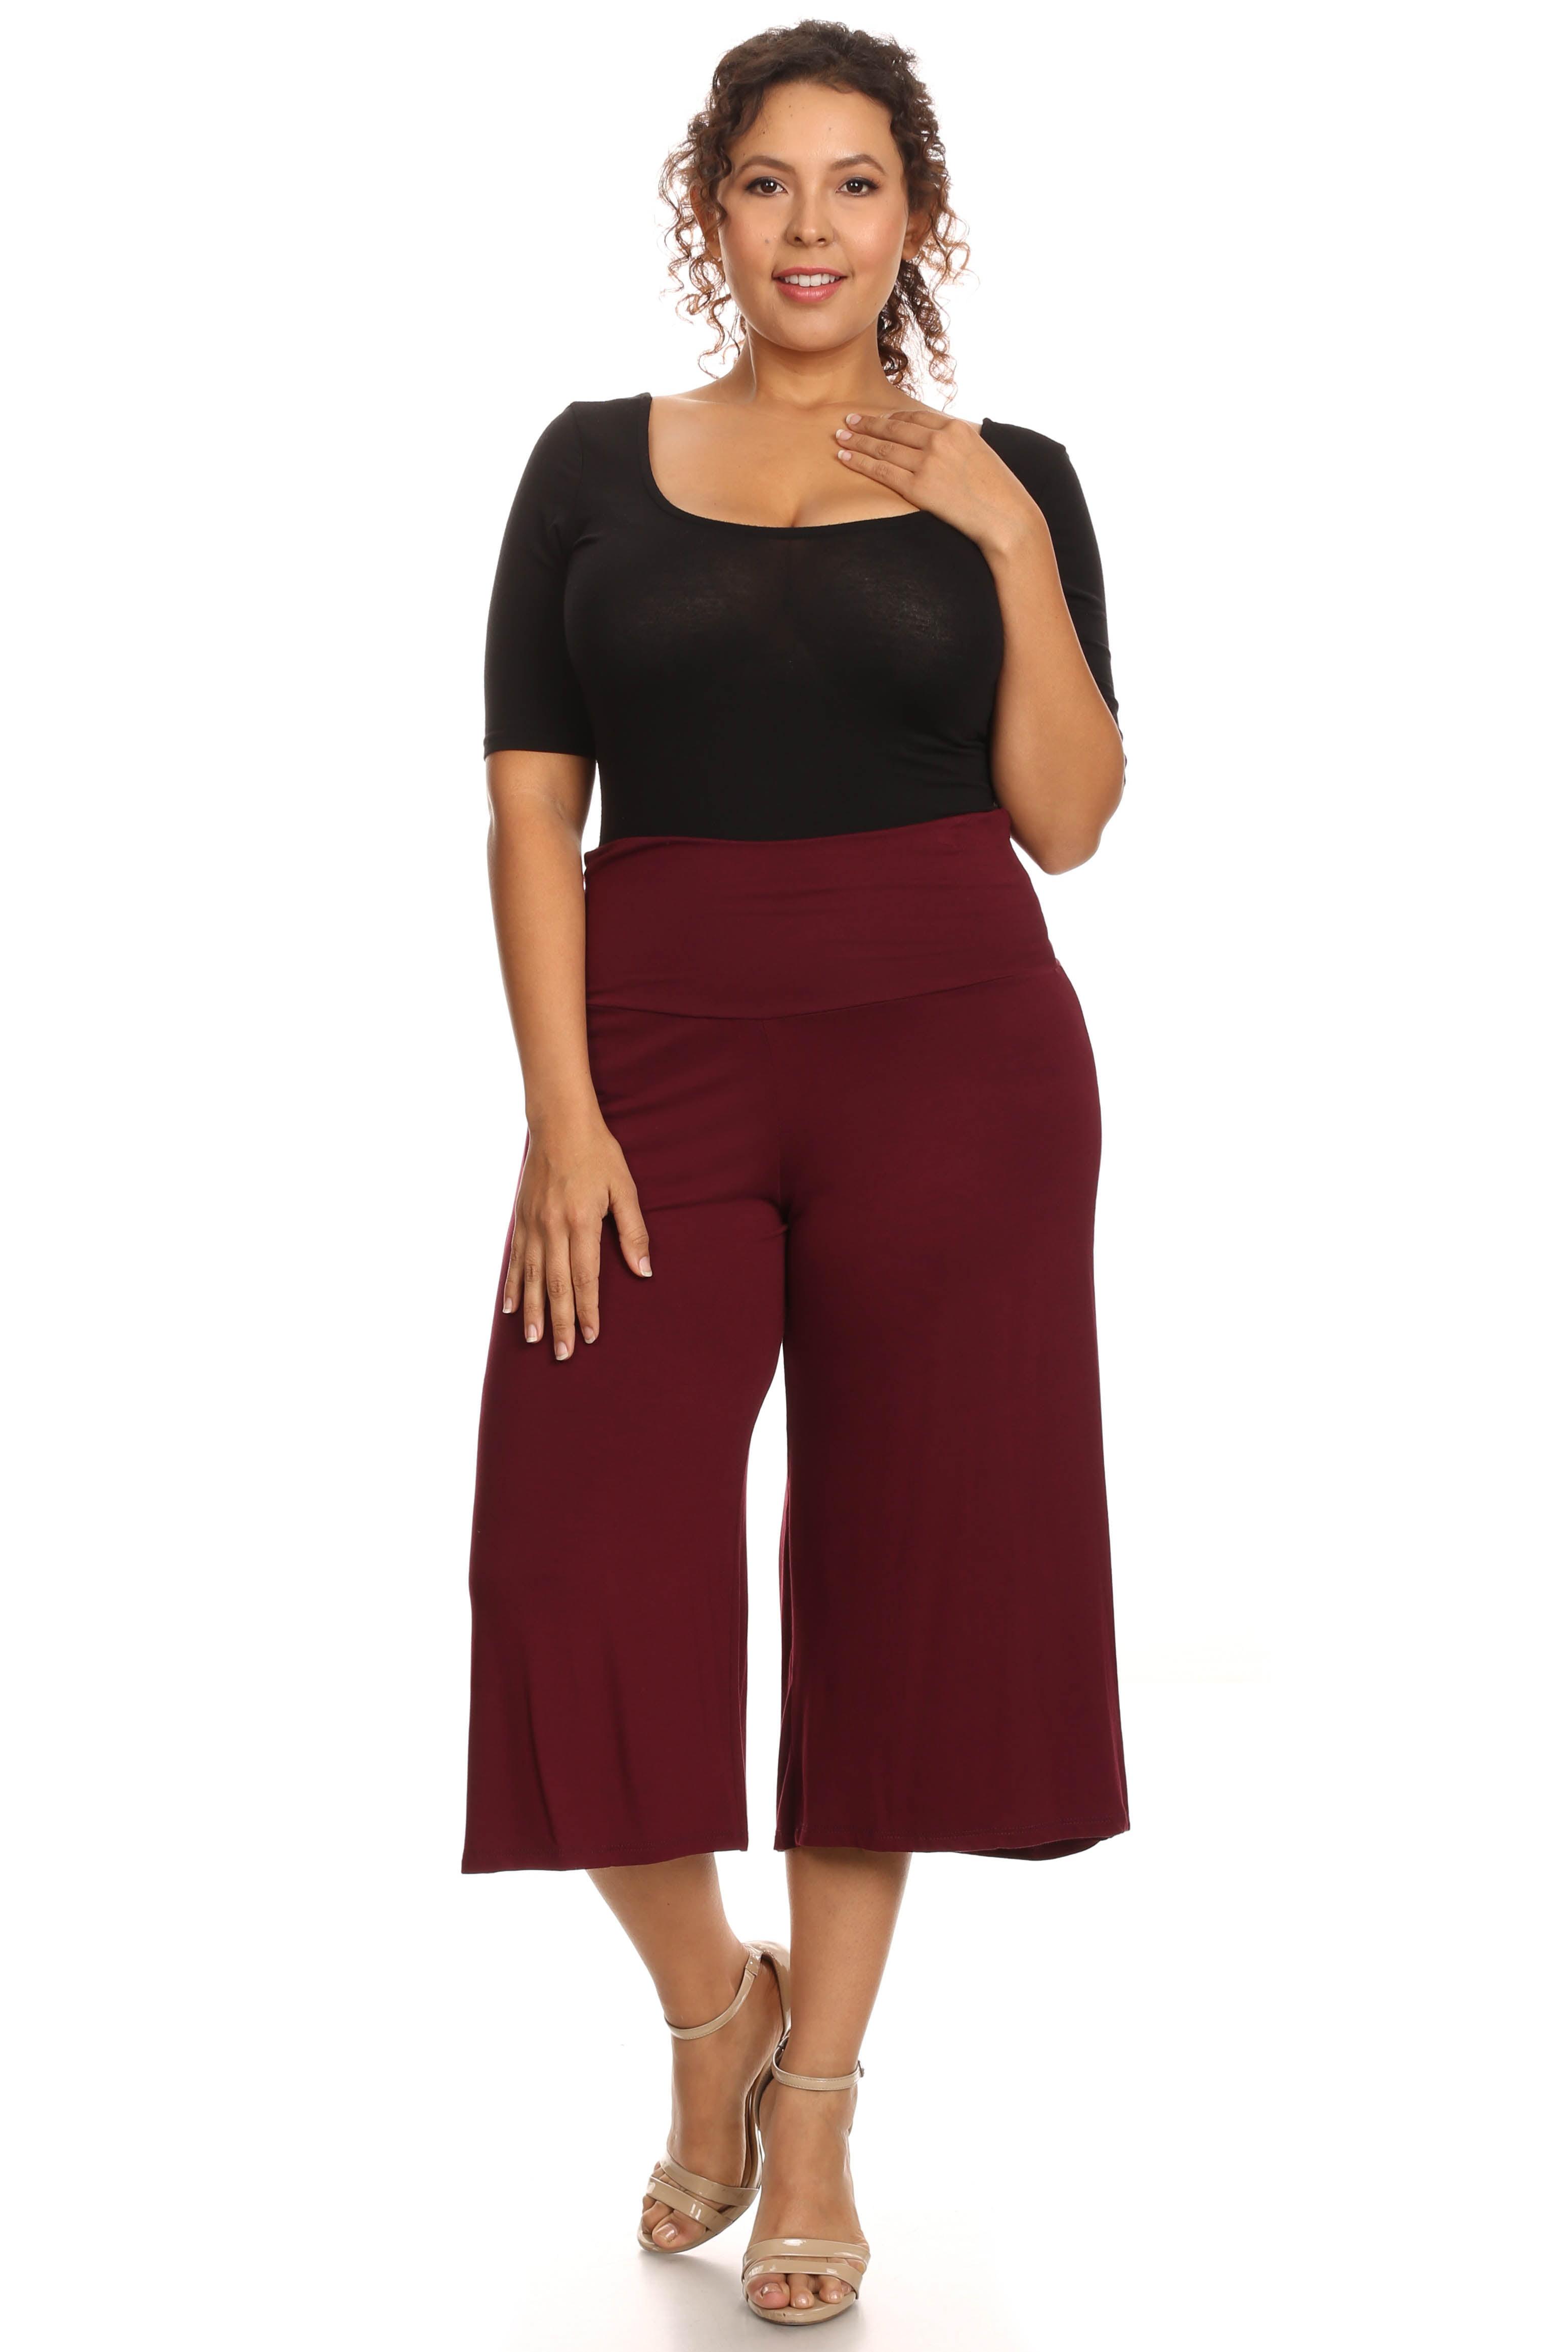 Plus Size Women's Gaucho Pants